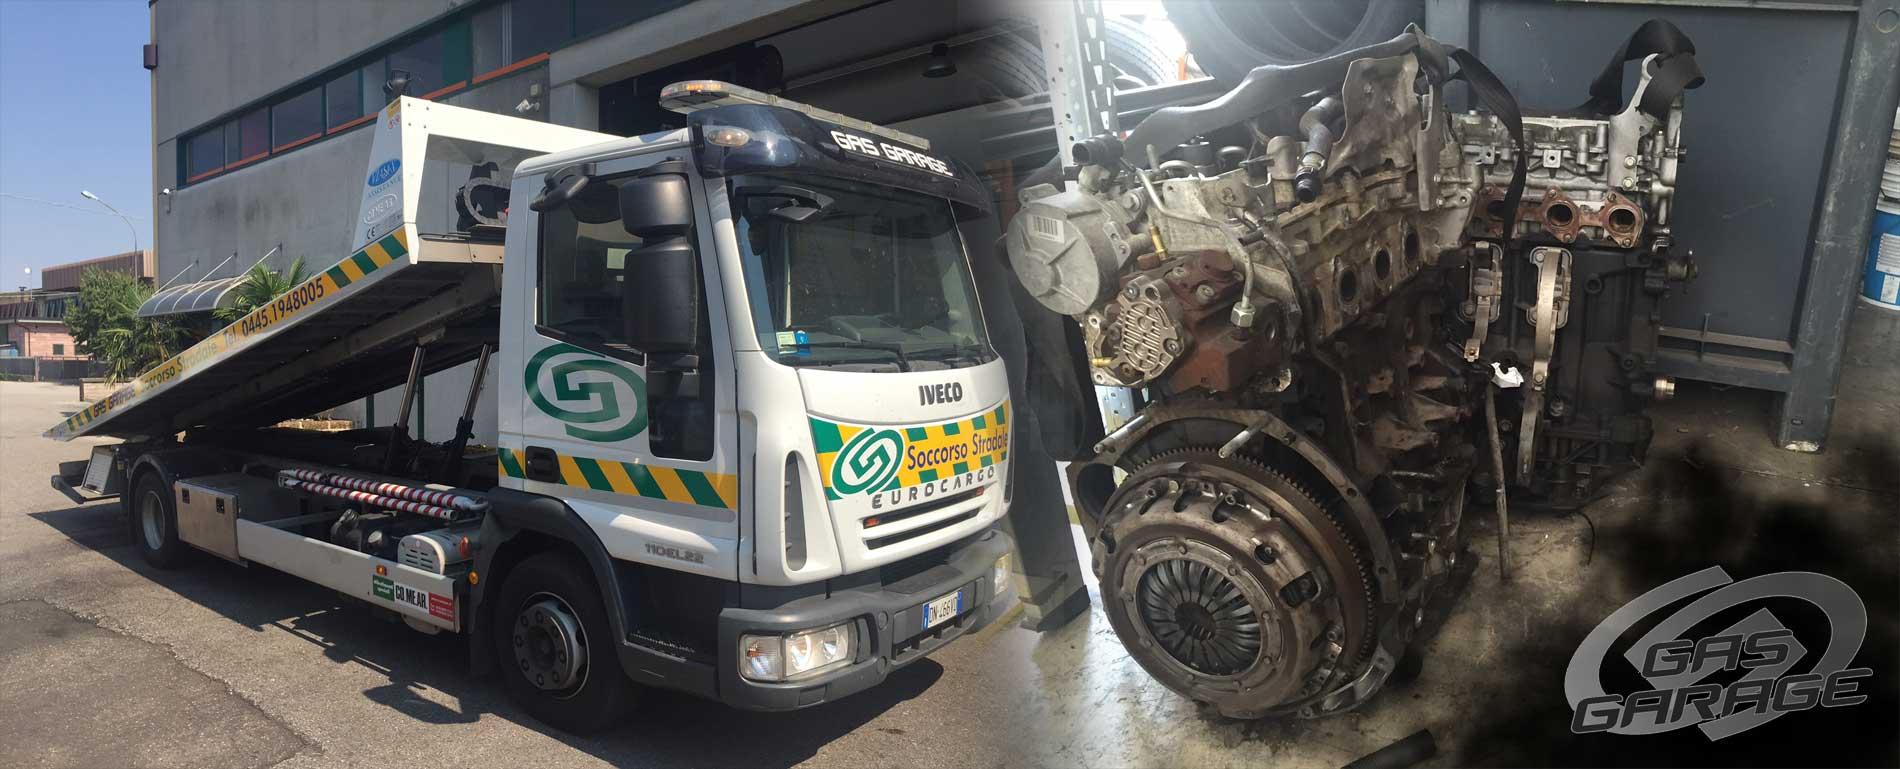 Gas Garage: autofficina e soccorso stradale